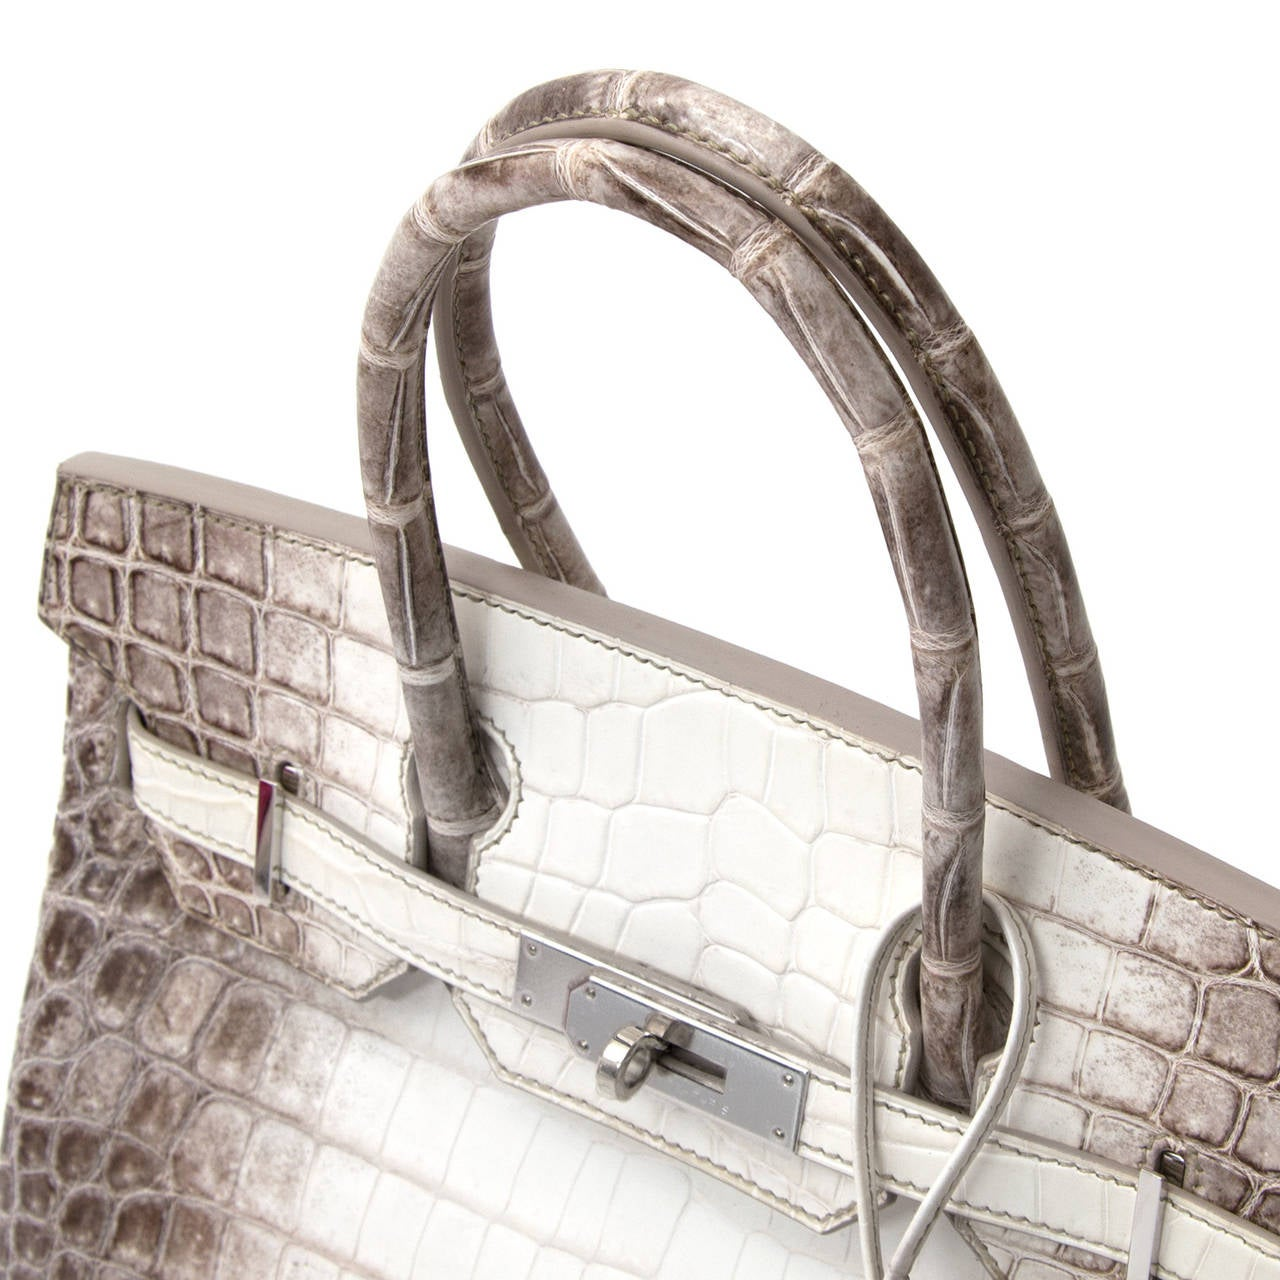 28b735a98f Hermès Birkin Bag Crocodile Niloticus Himalaya Handbag White PHW 30 For  Sale 5